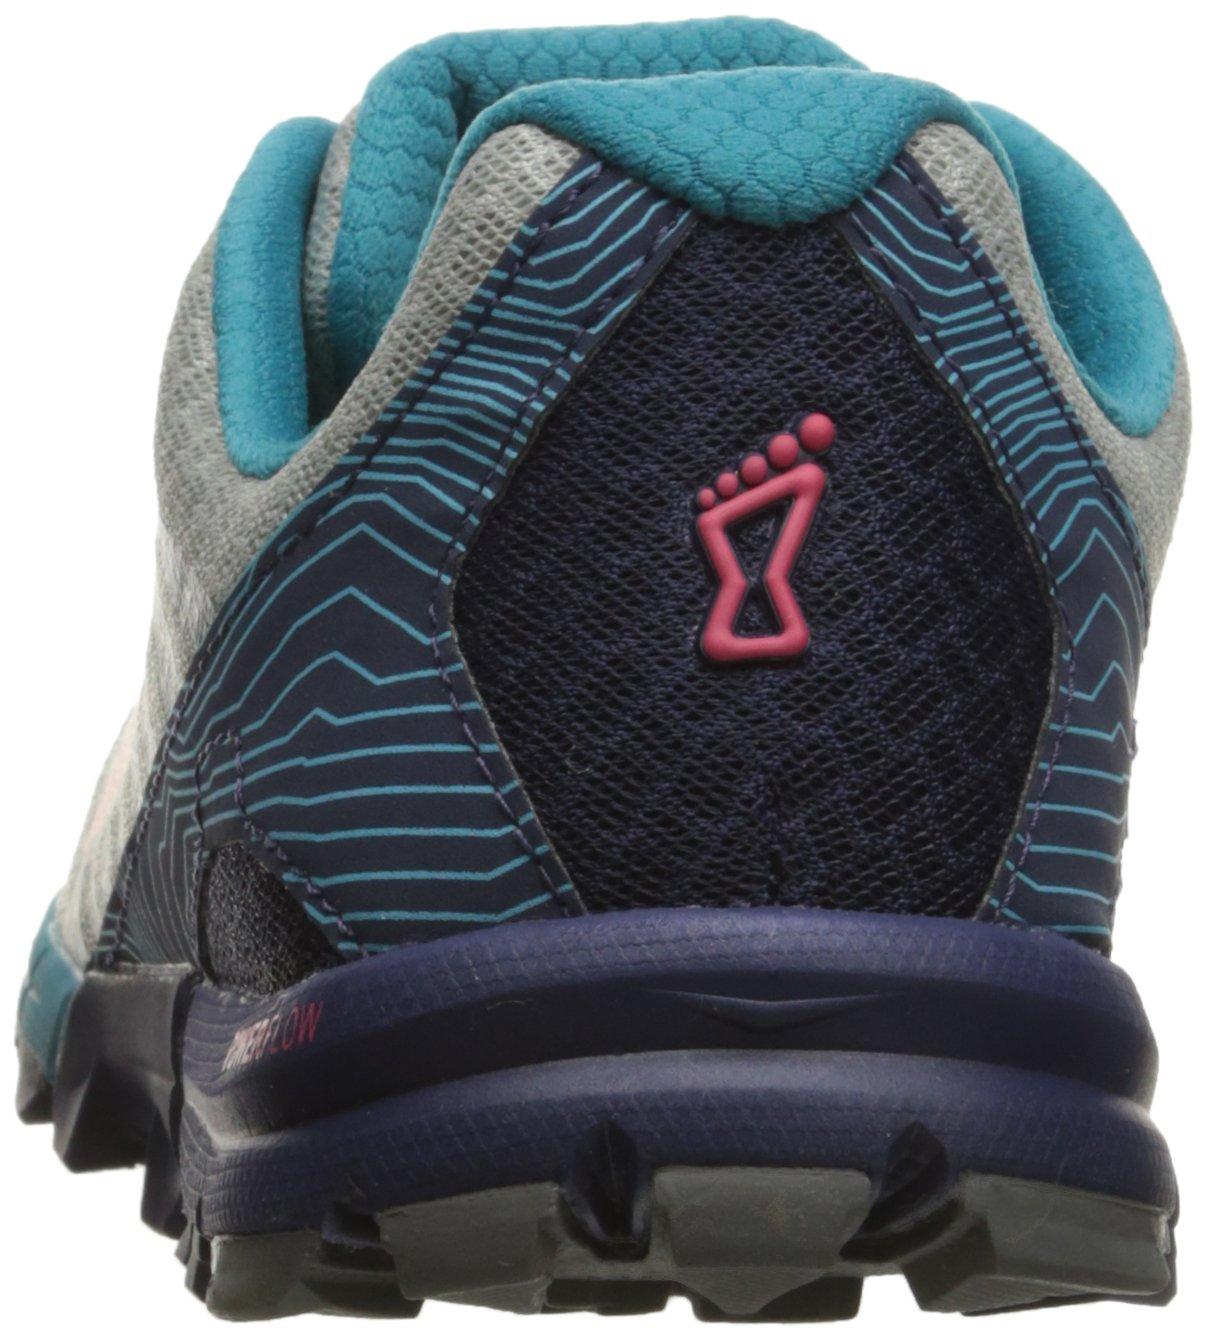 Inov-8 Women's Trailtalon聶 250-U Trail US|Silver/Navy/Teal Runner B01B26WM0Q 5.5 B(M) US|Silver/Navy/Teal Trail 12a8e5